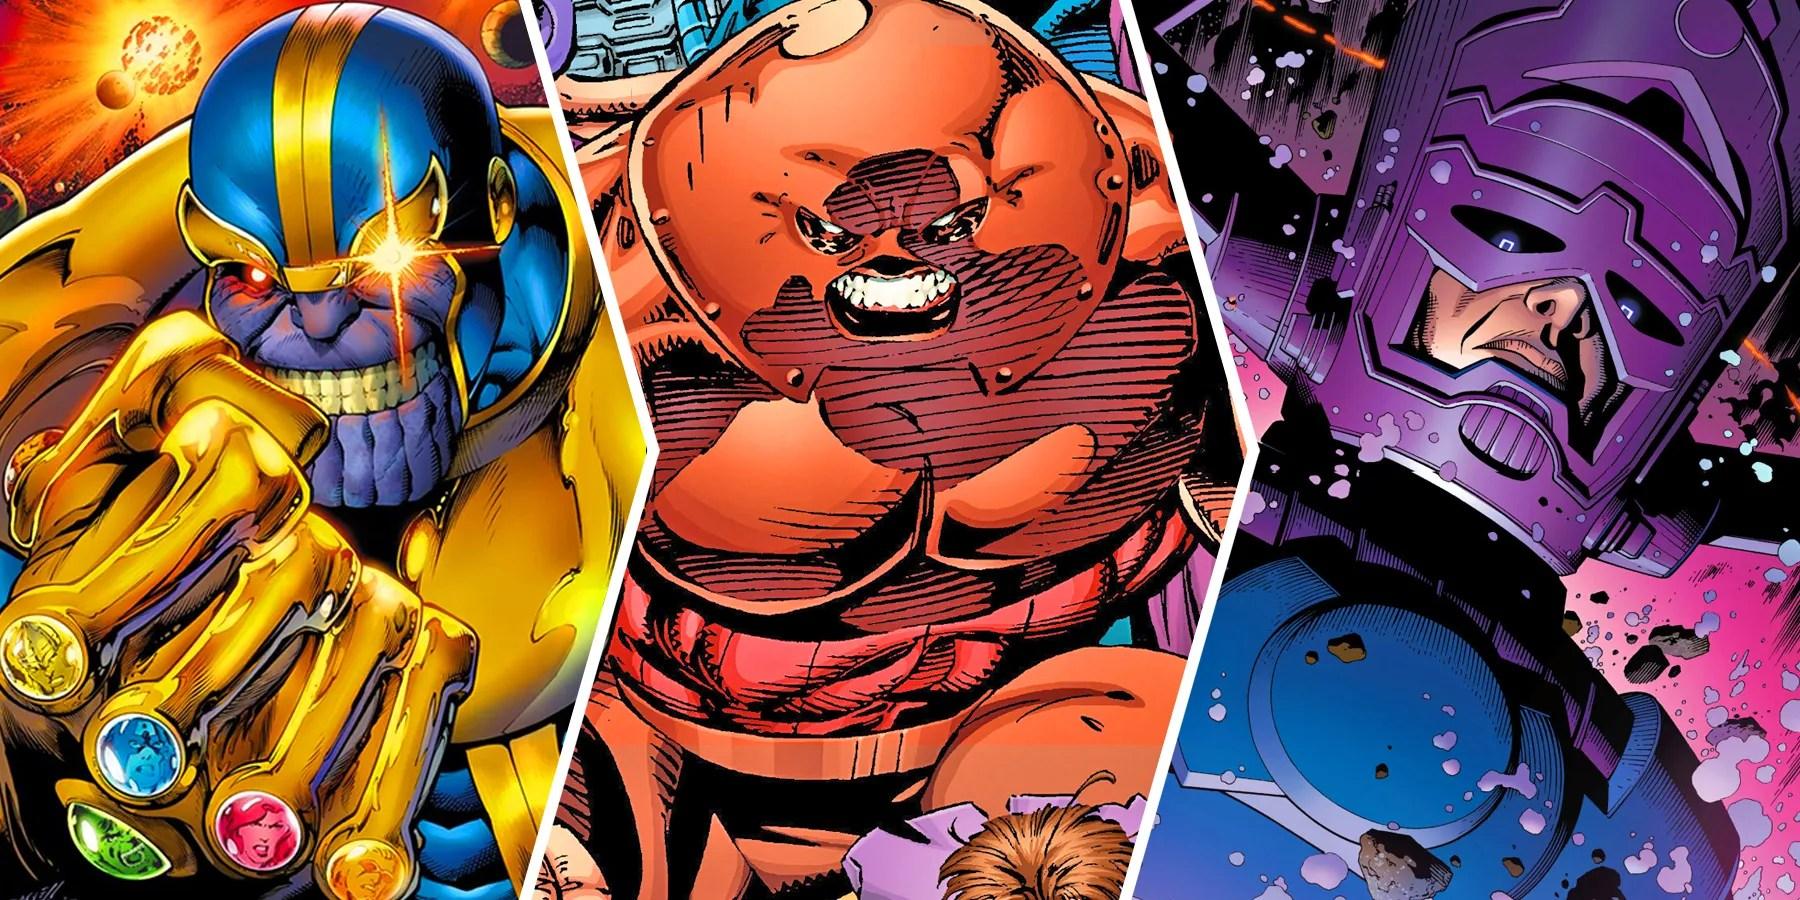 juggernauts: marvel's 20 strongest villains, officially ranked